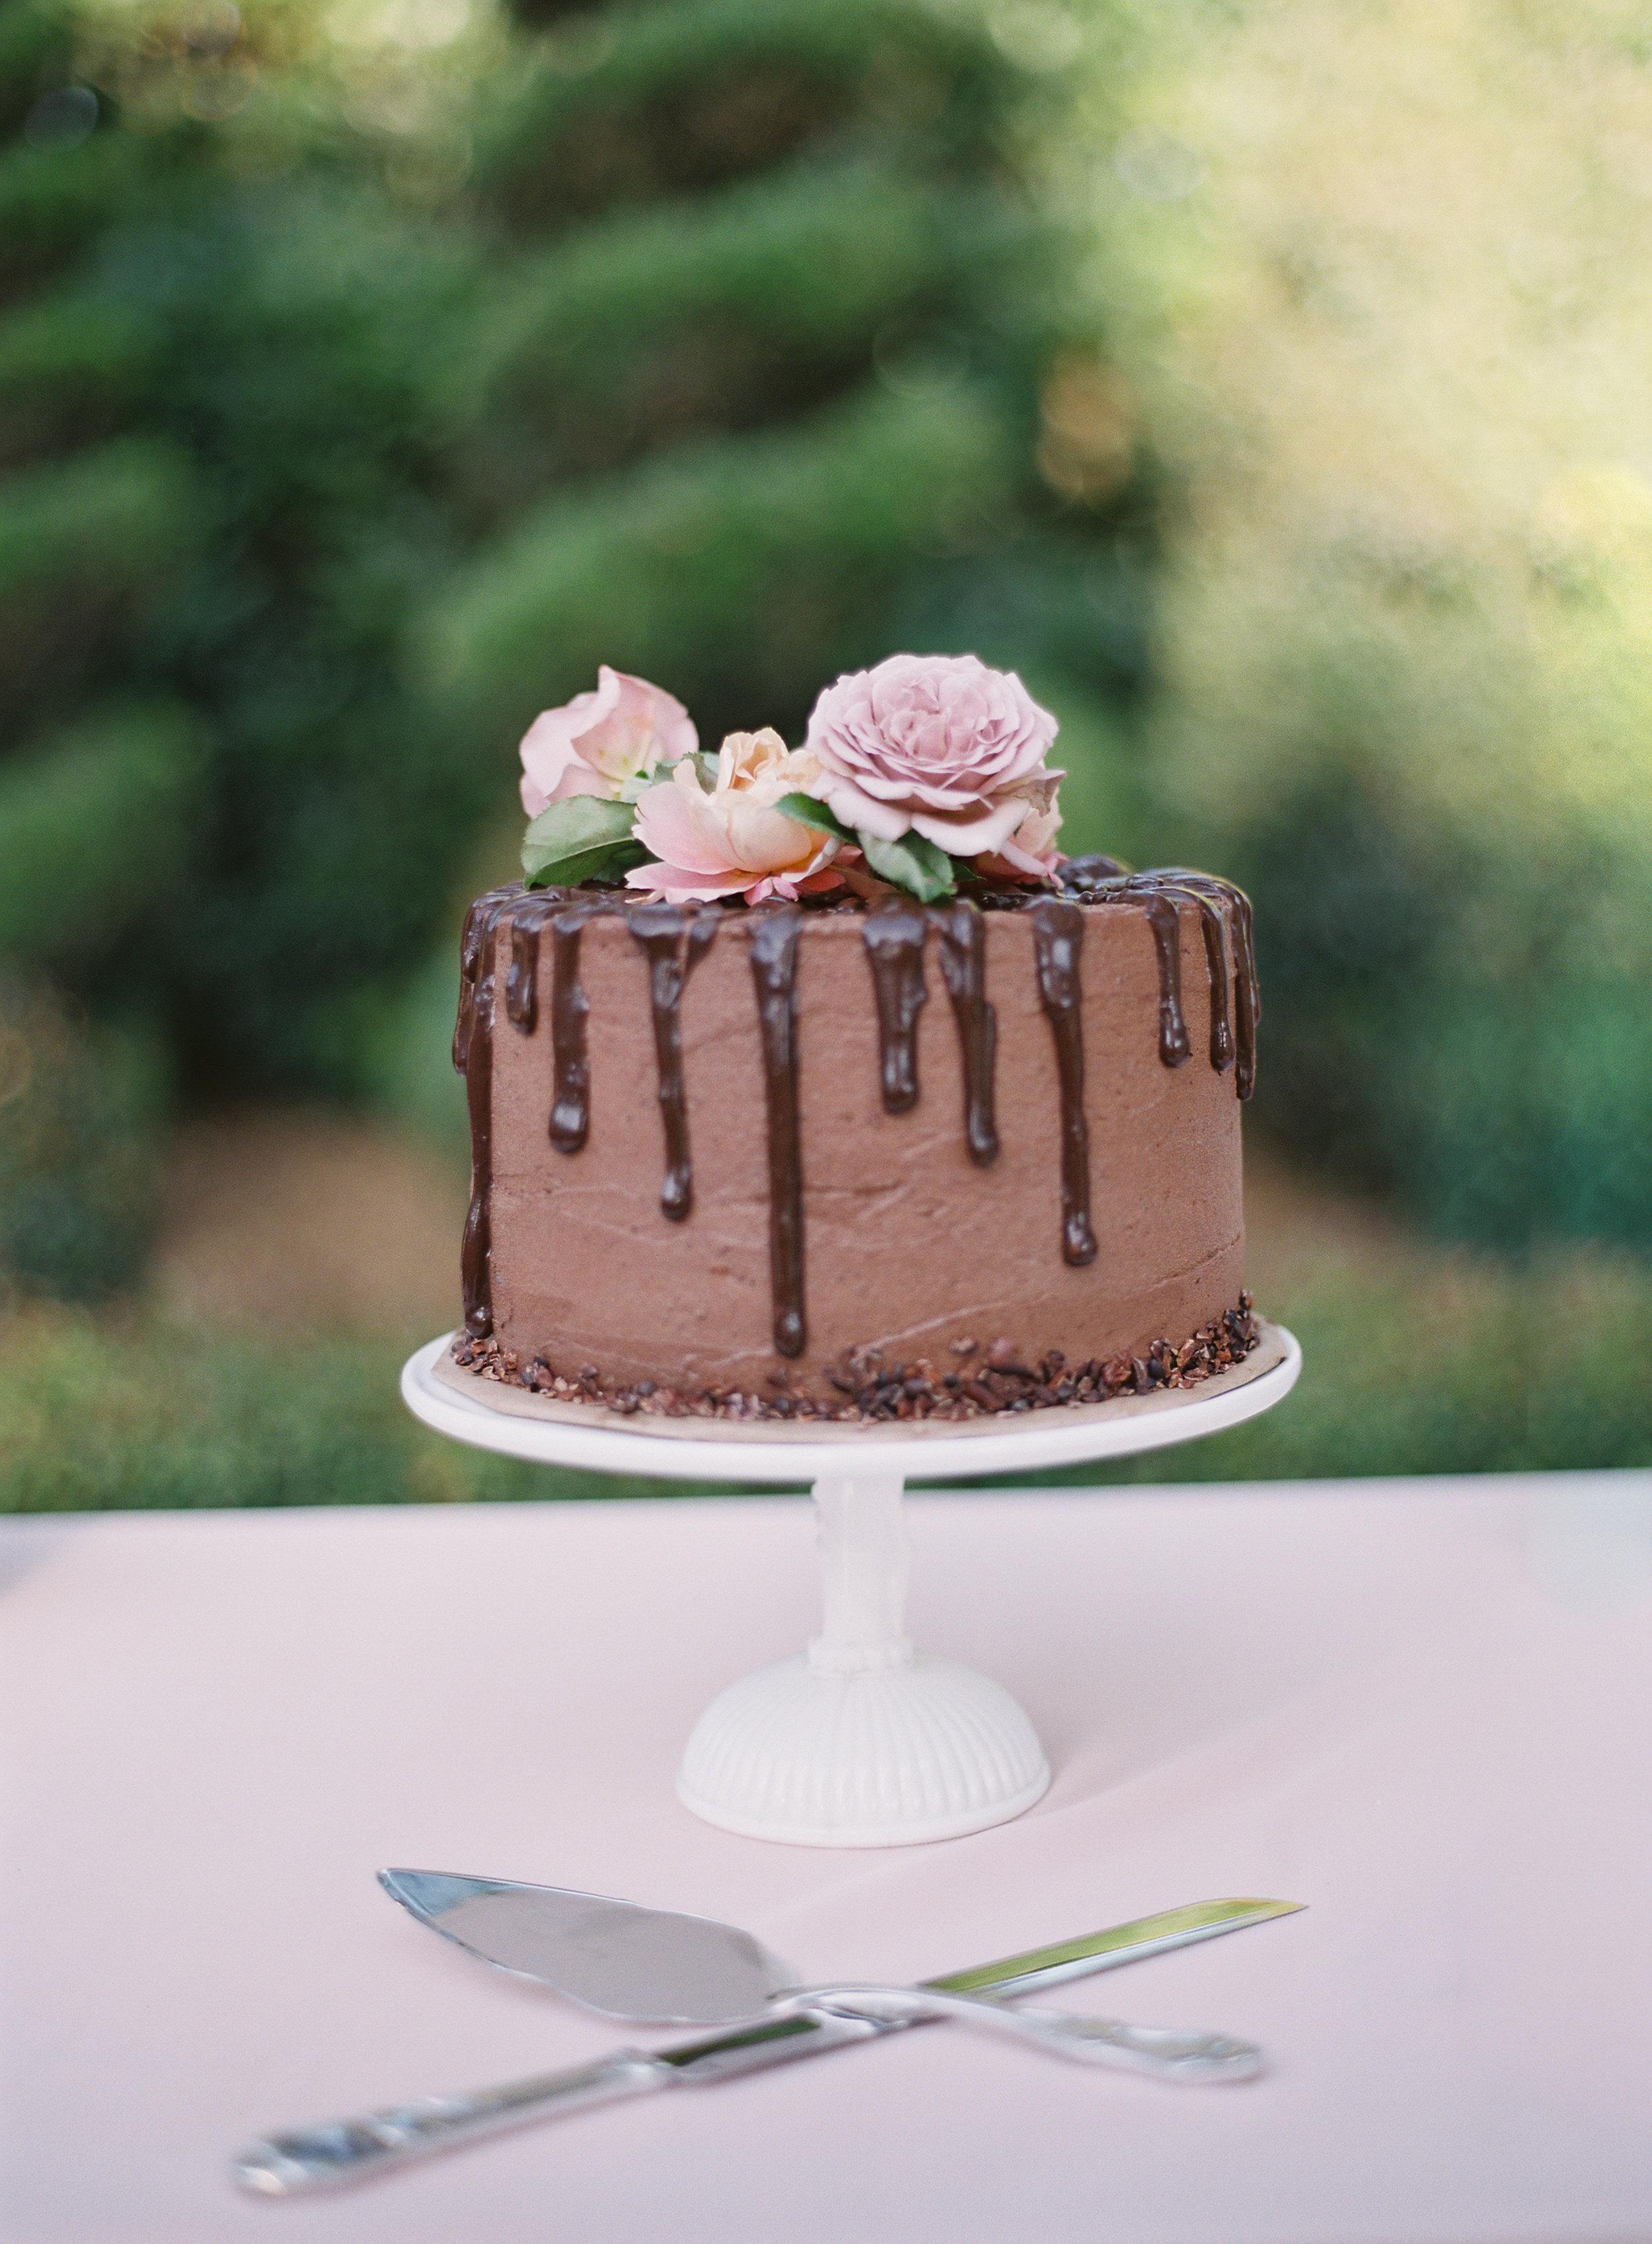 chocolate cutting cake with fresh flowers